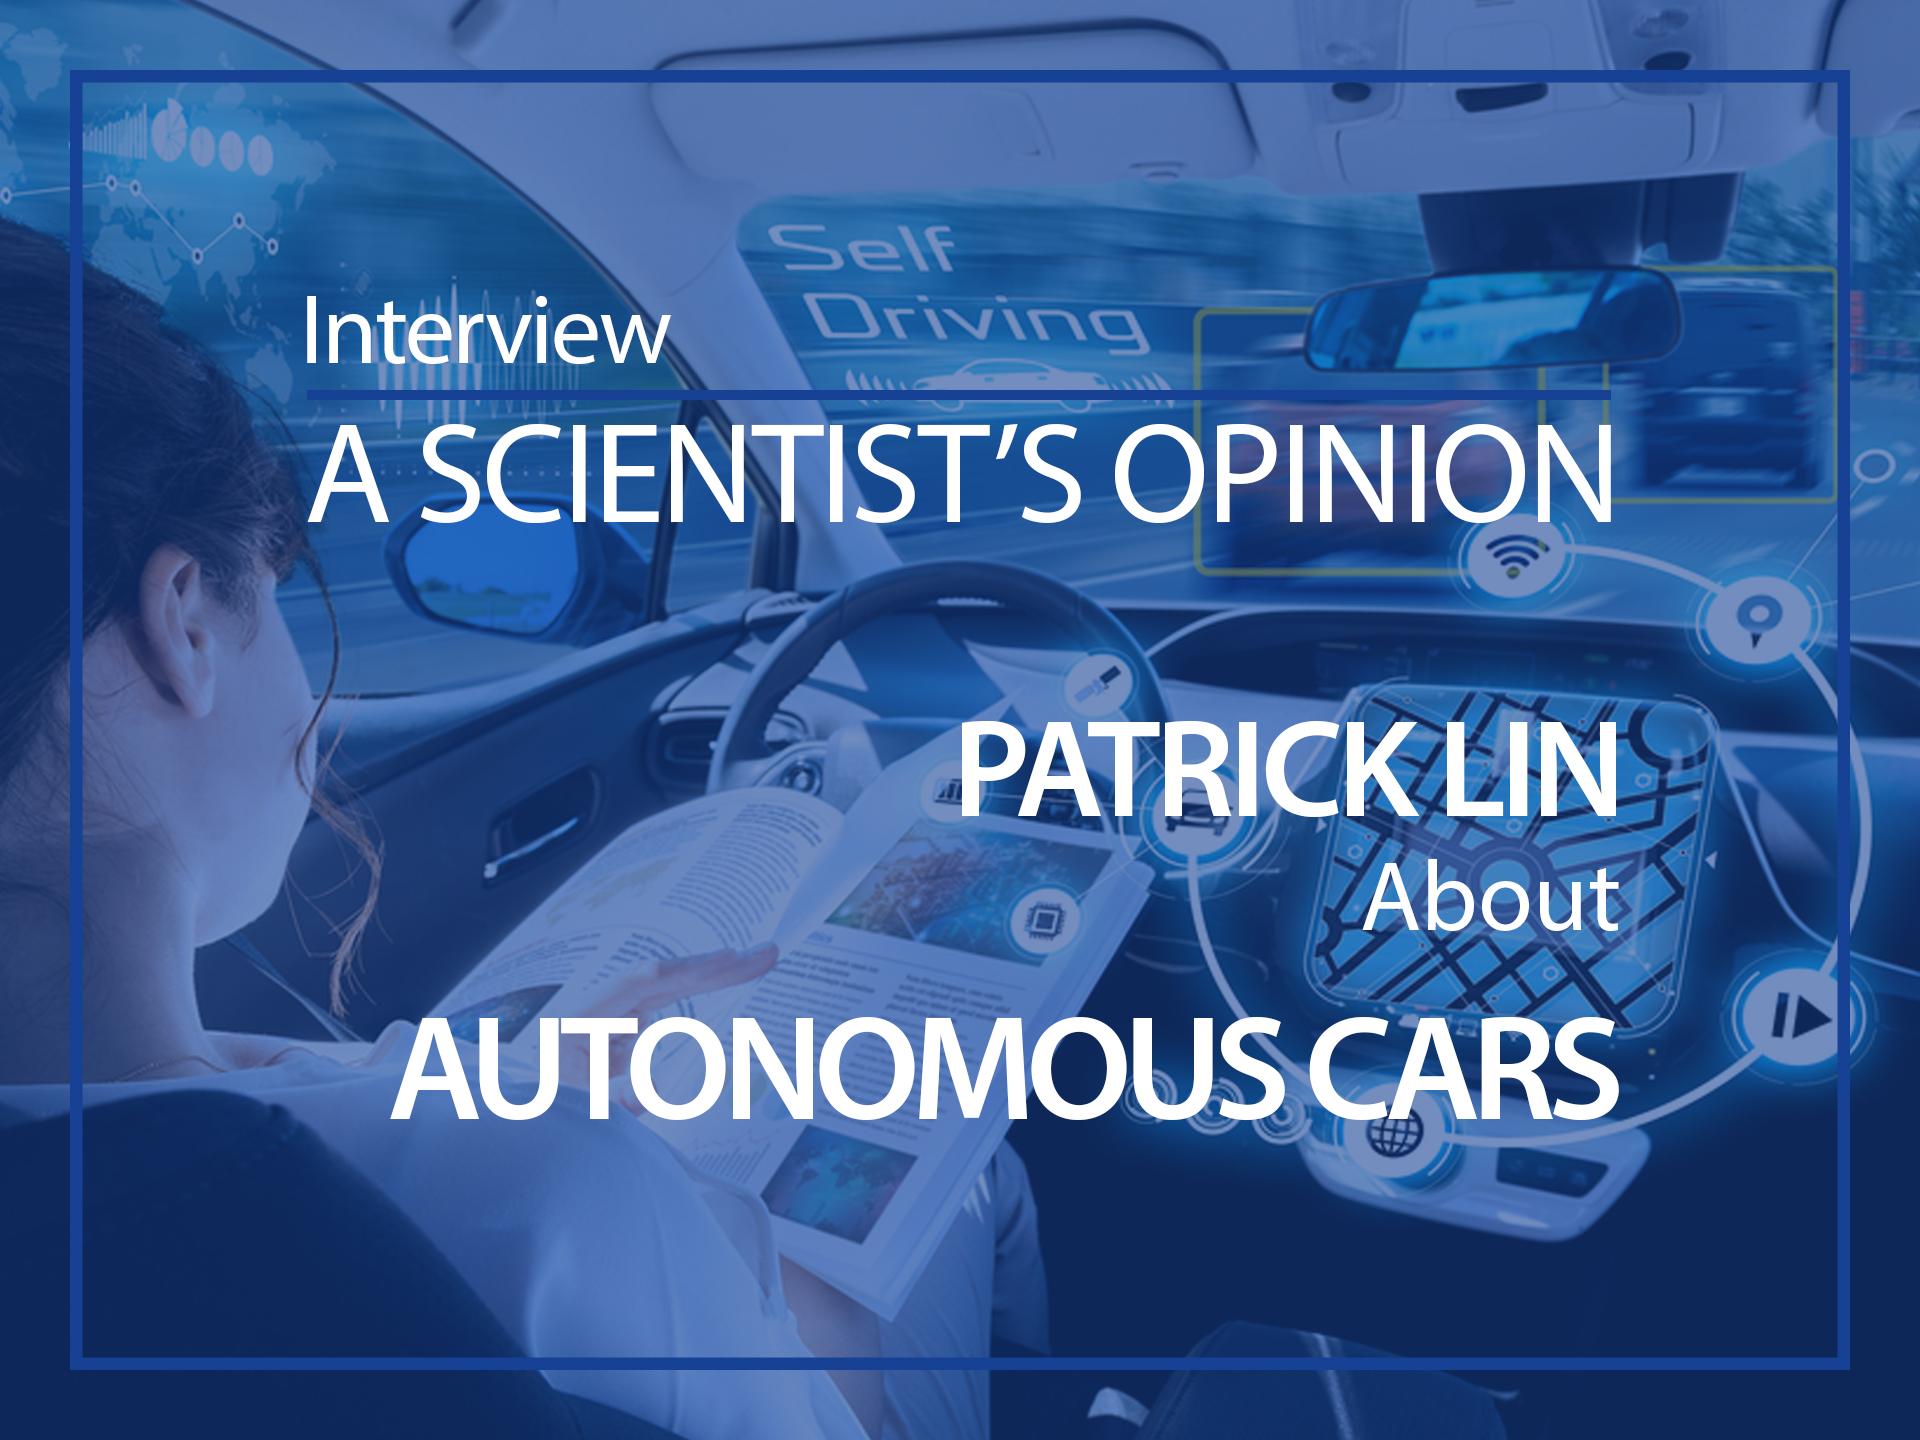 A scientist's opinion : Interview with Patrick Lin about autonomous cars